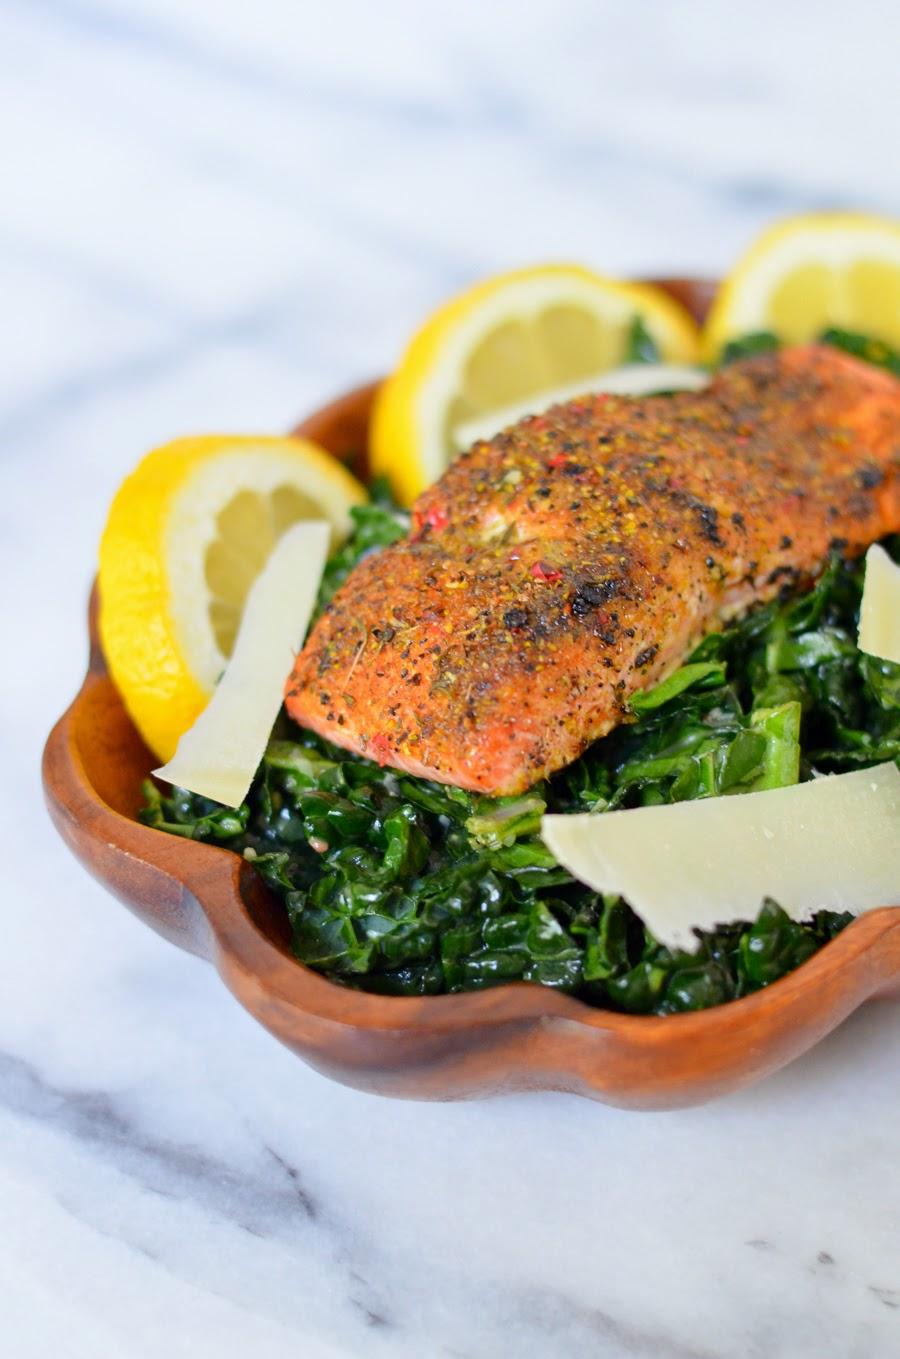 Kale Caesar Salad w. Lemon Pink Peppercorn Salmon | Homemade Caesar Salad Dressing Recipe | Luci's Morsels :: LA Healthy Food Blog